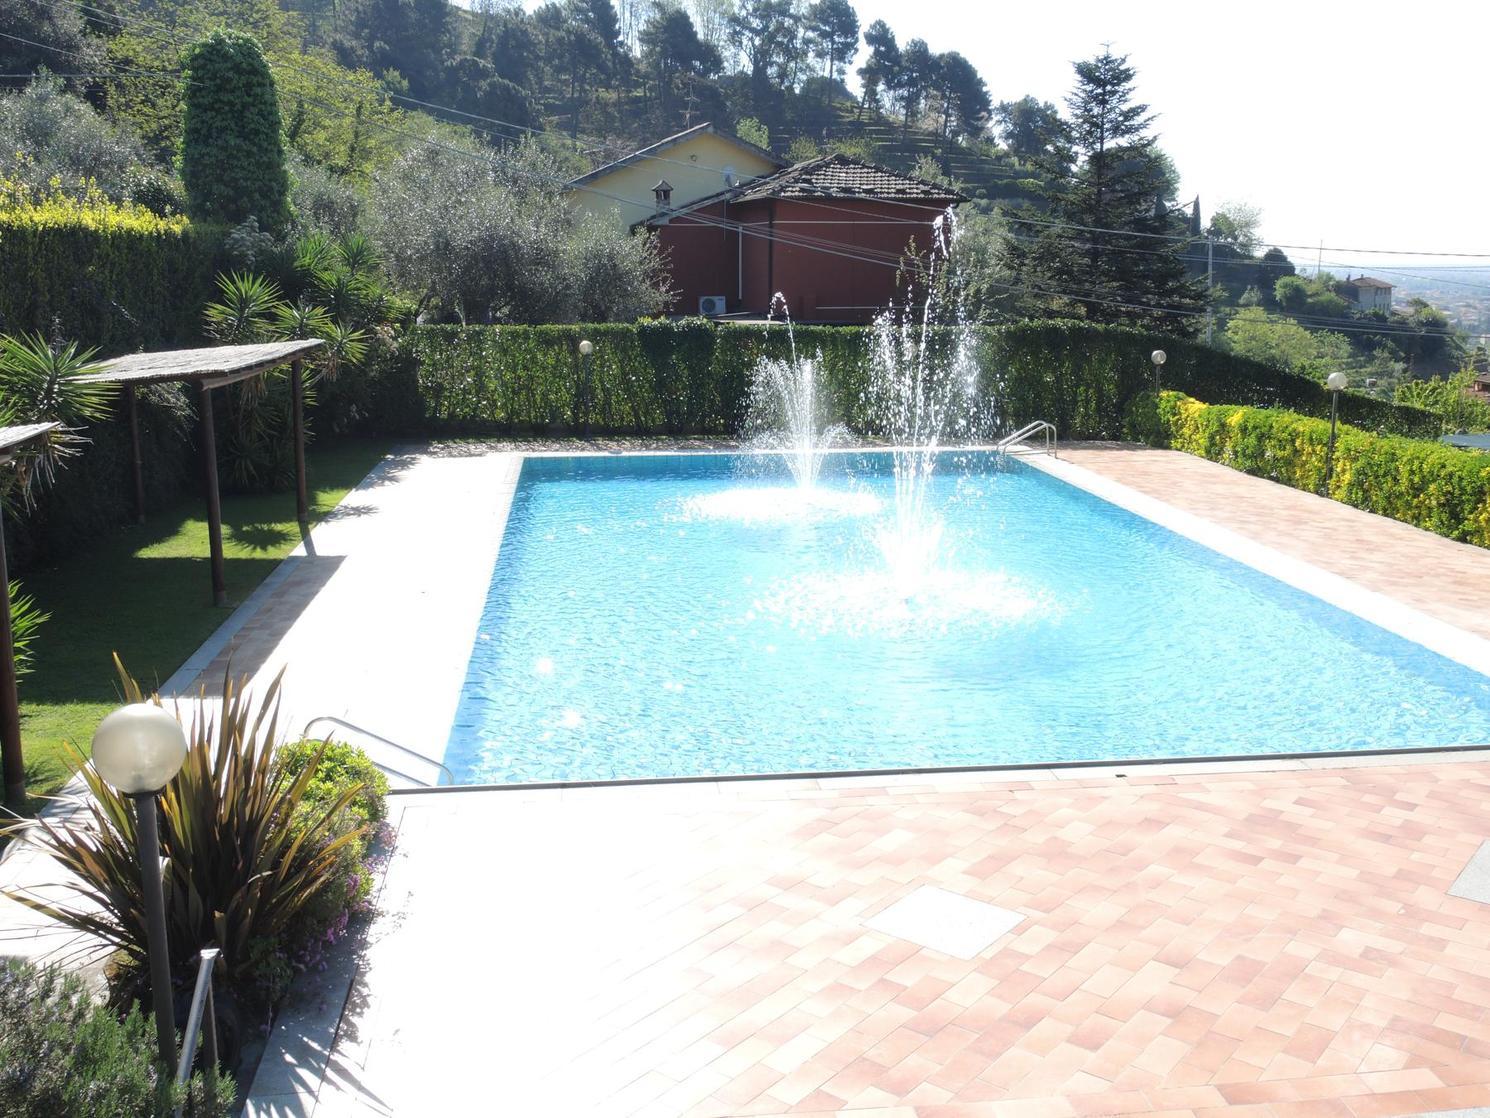 grappolo-d-oro-piscina